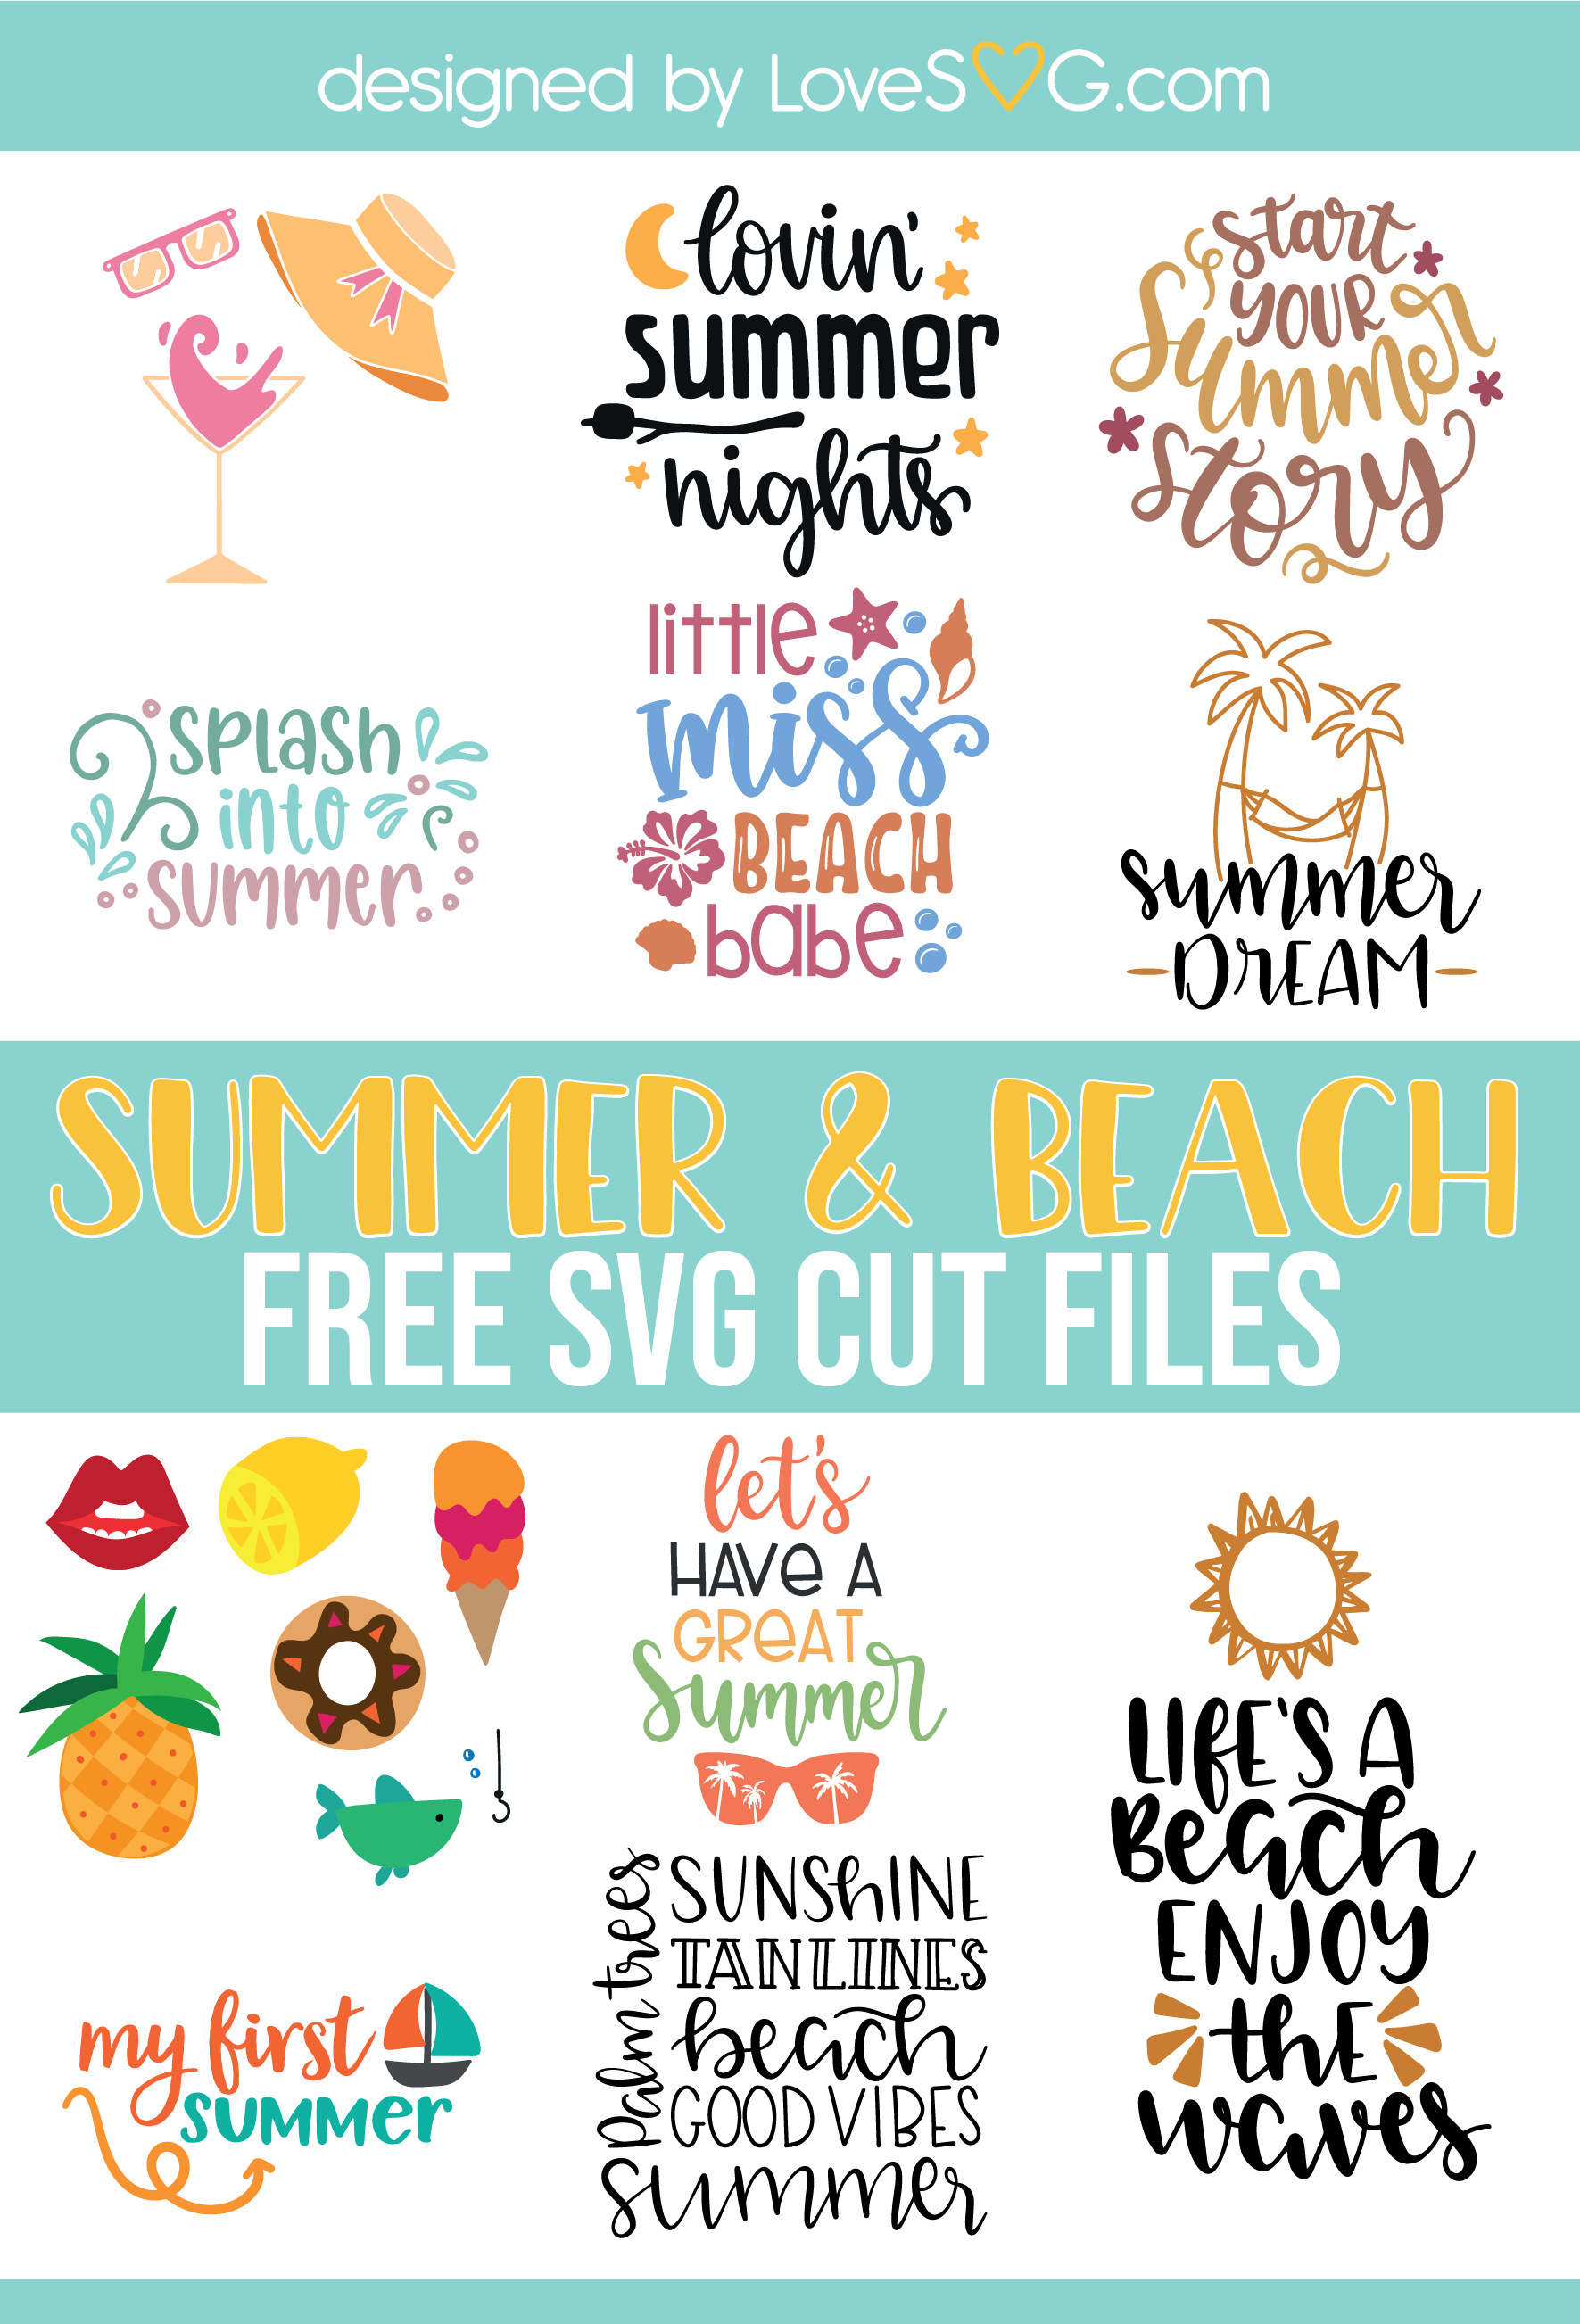 Pin by LoveSVG com | Free SVG Cut Files on Free Summer SVG